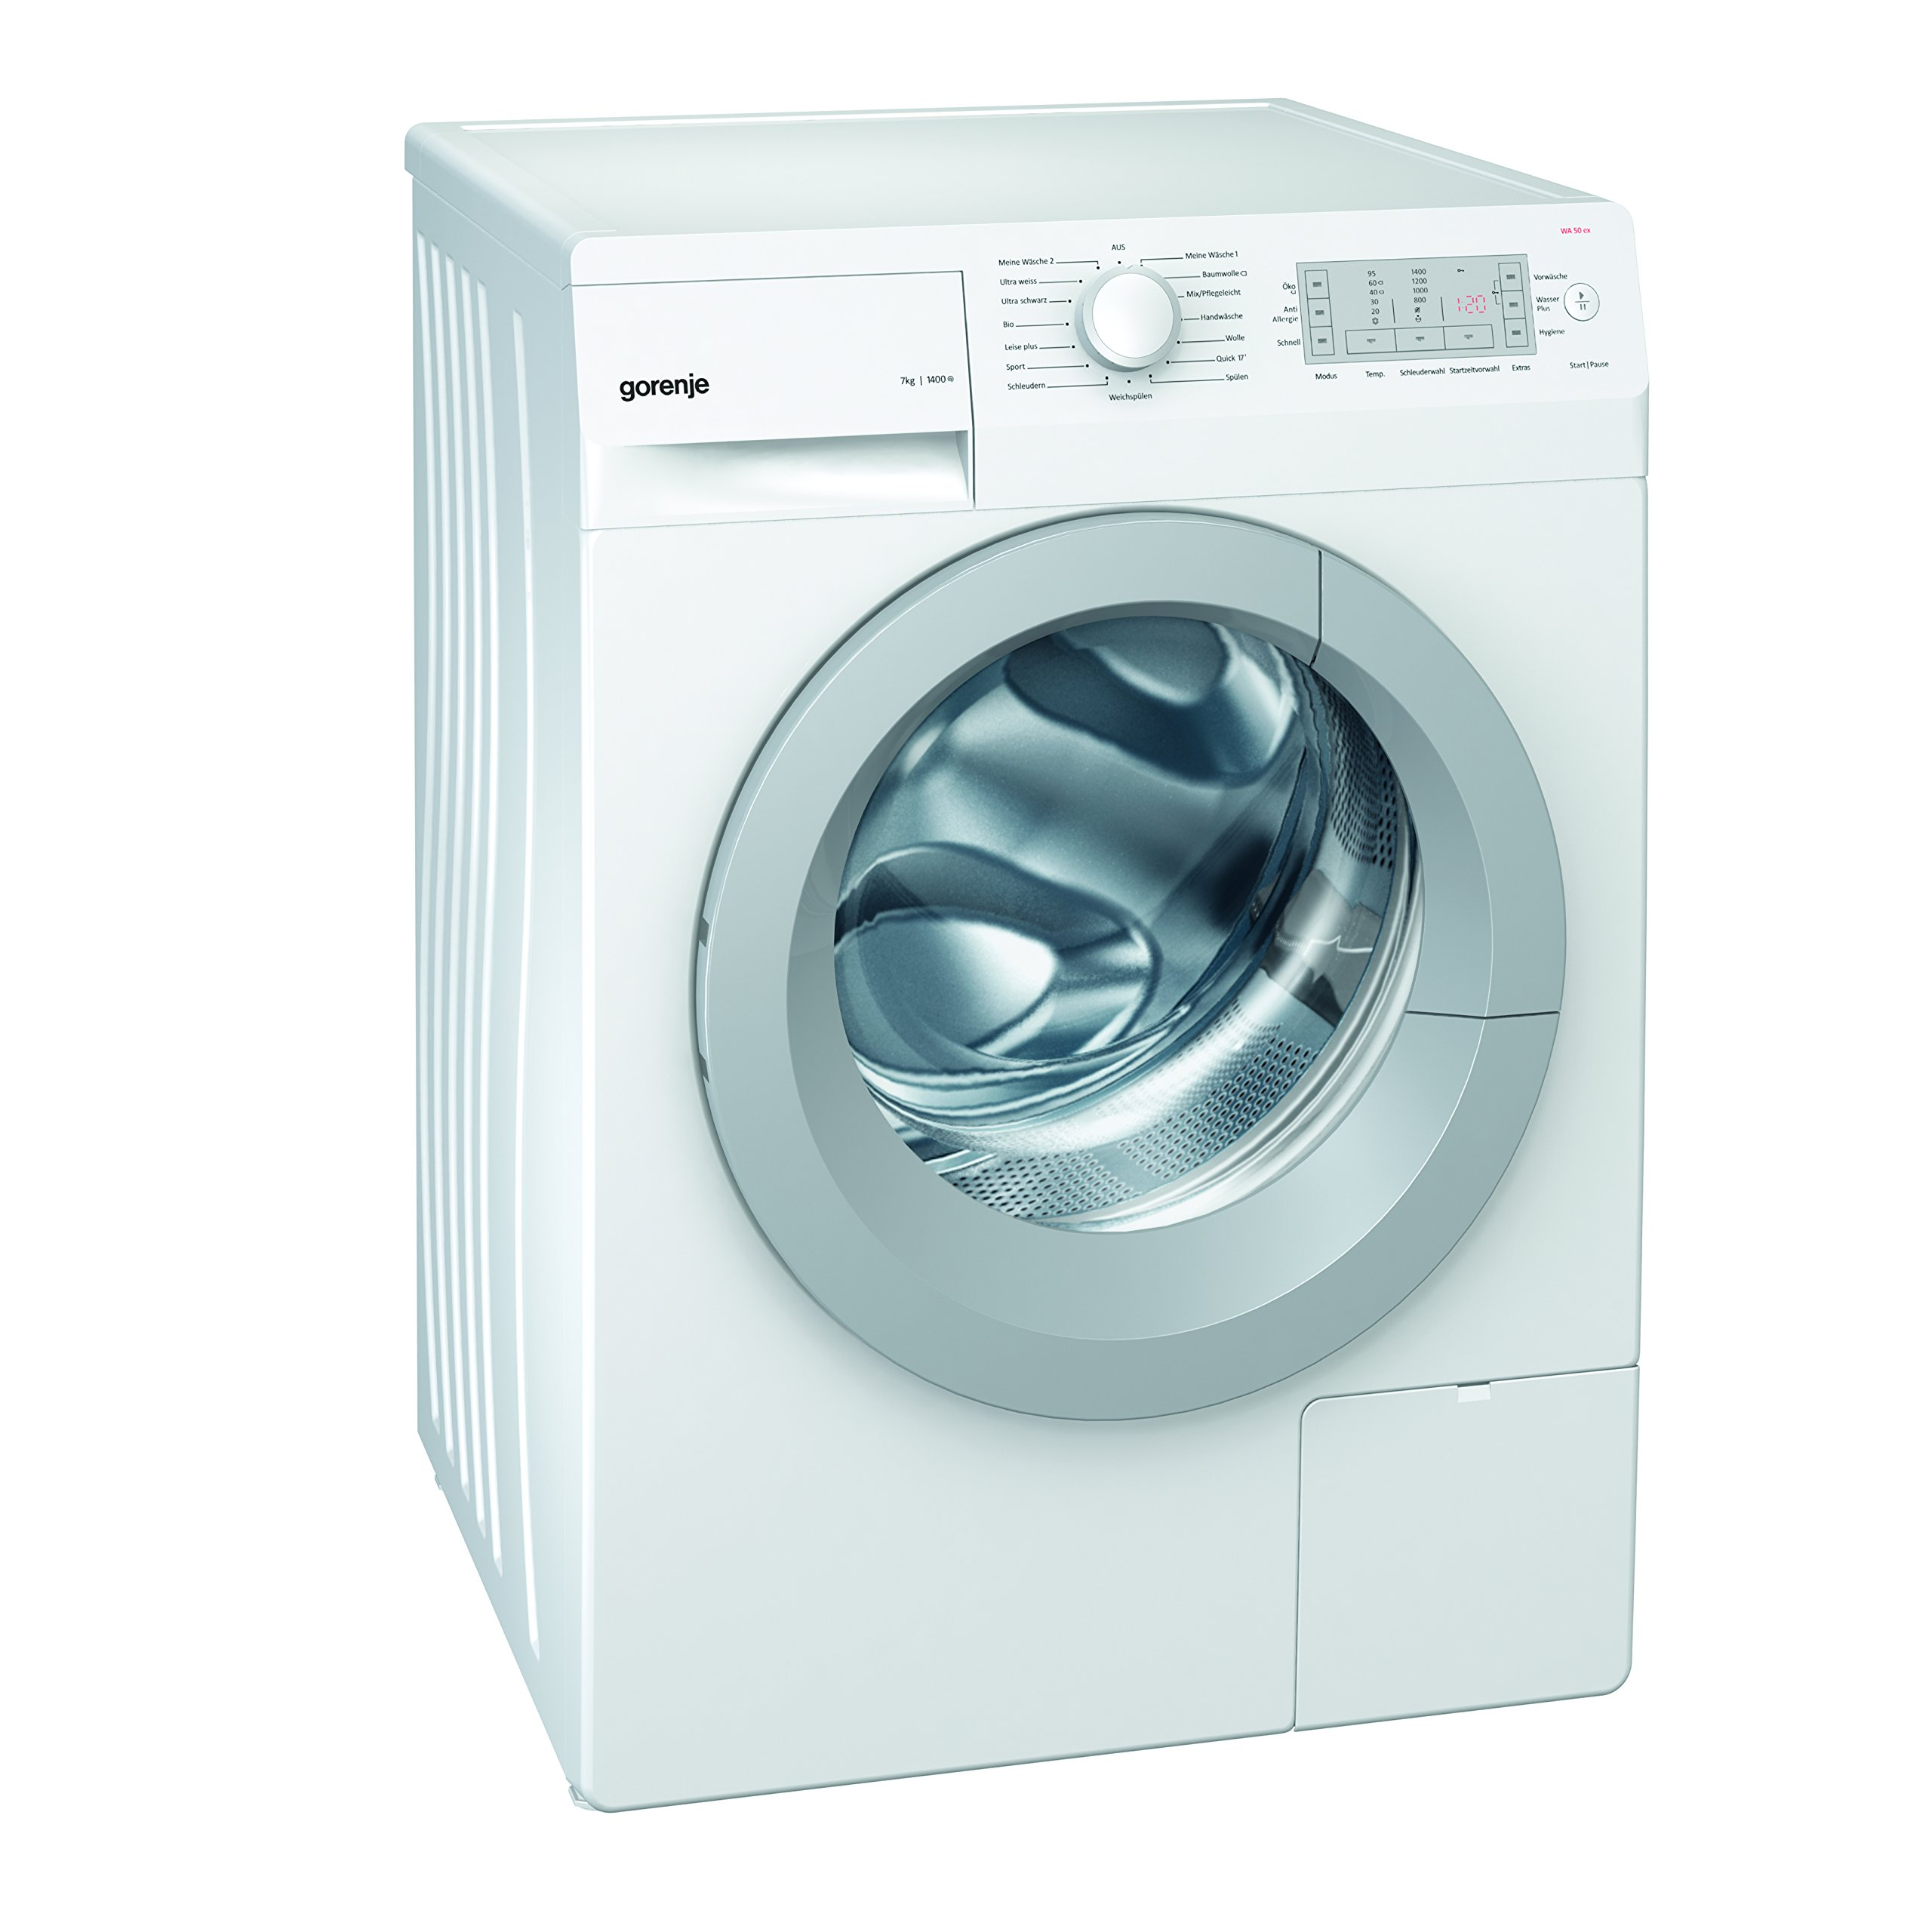 Gorenje-WA-50-EX-Waschmaschine-FL-A-7-kg-1400-UpM-wei-Totaler-AquaStop-SensoCare-Waschsystem-Quick17